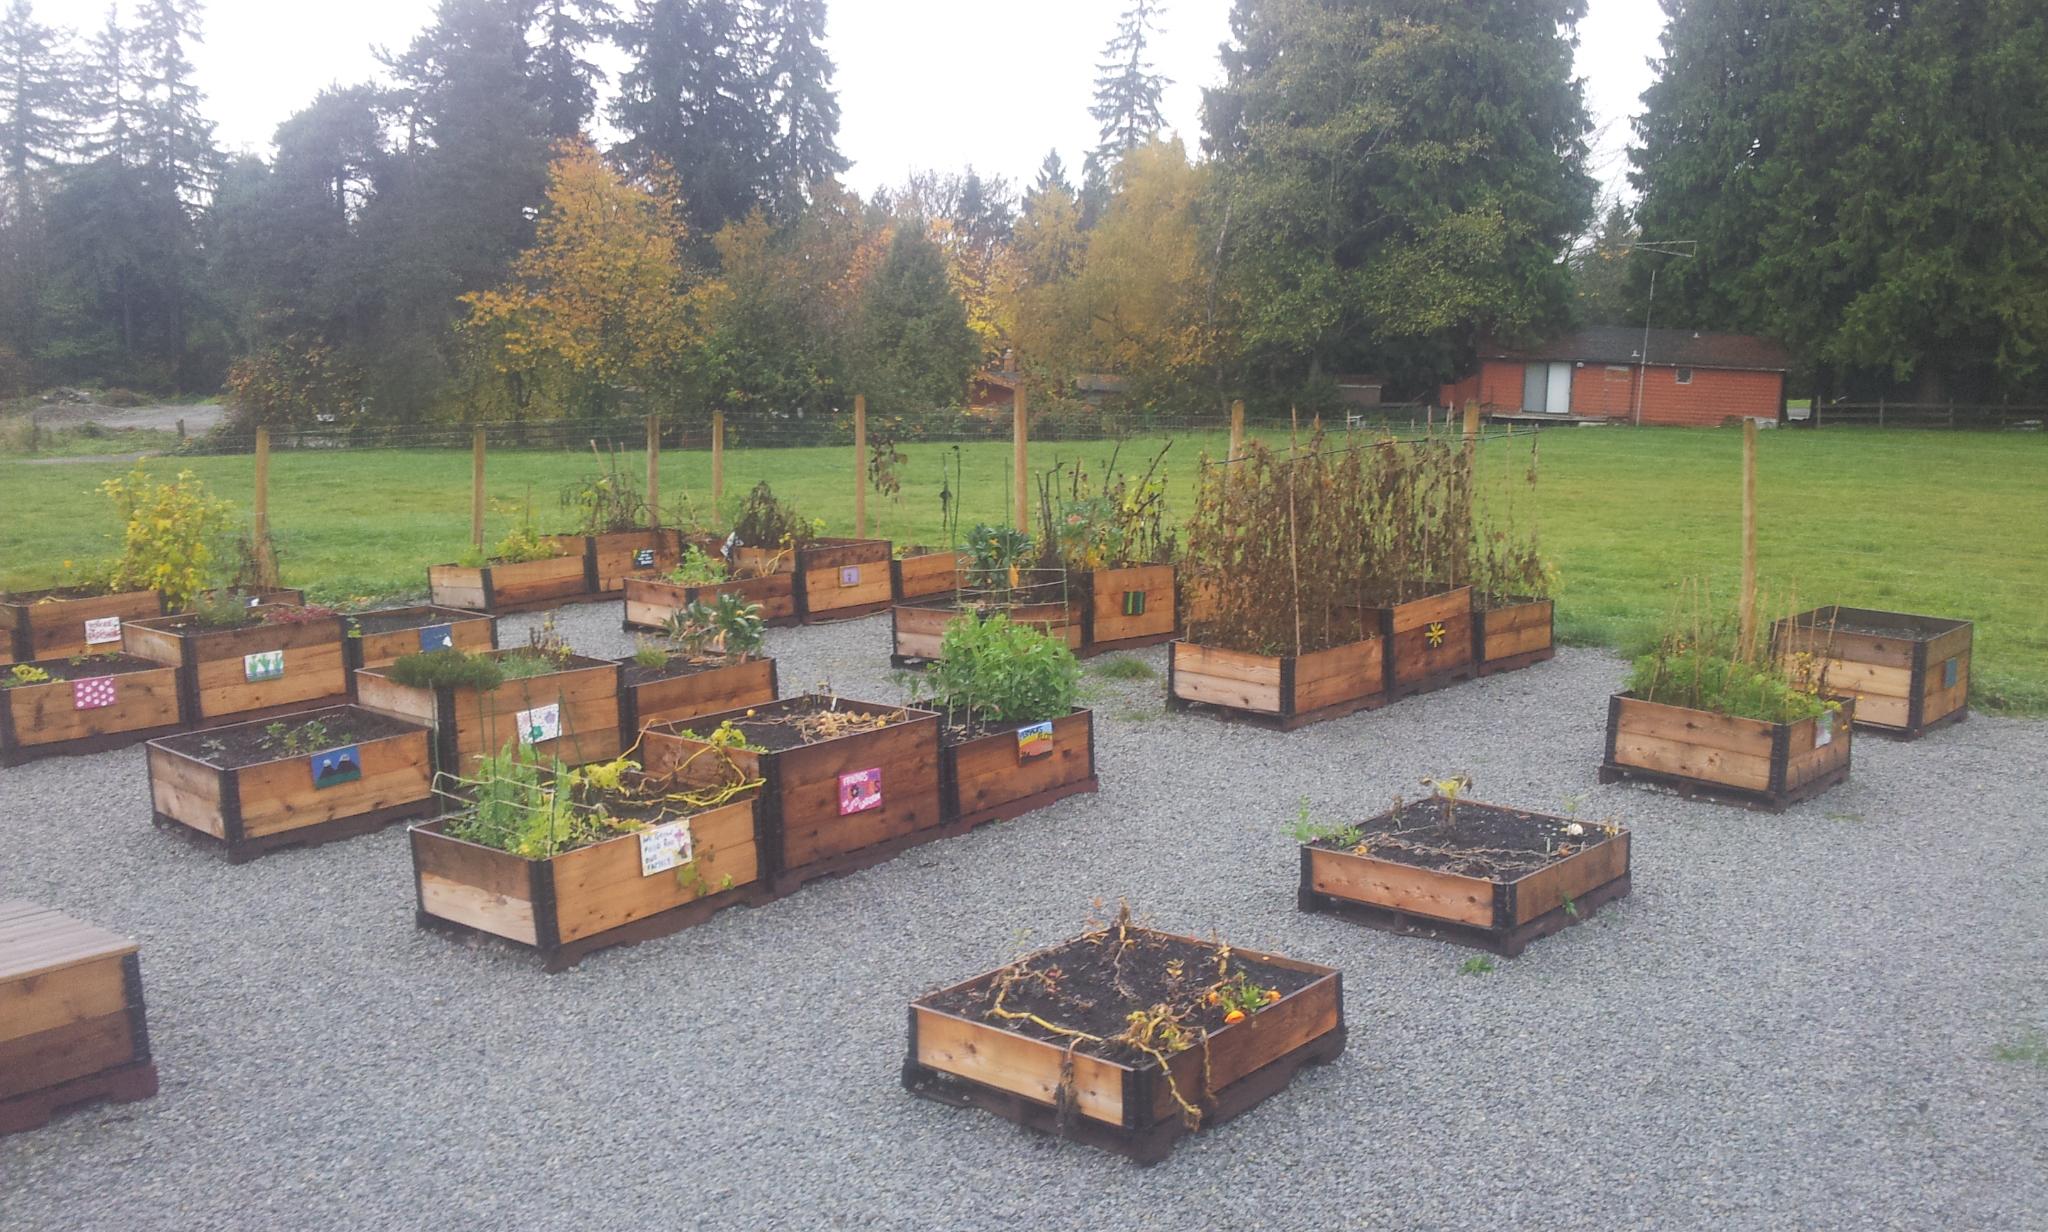 burke-mountain-temporary-community-garden-closing-112013_11244686013_o.jpg